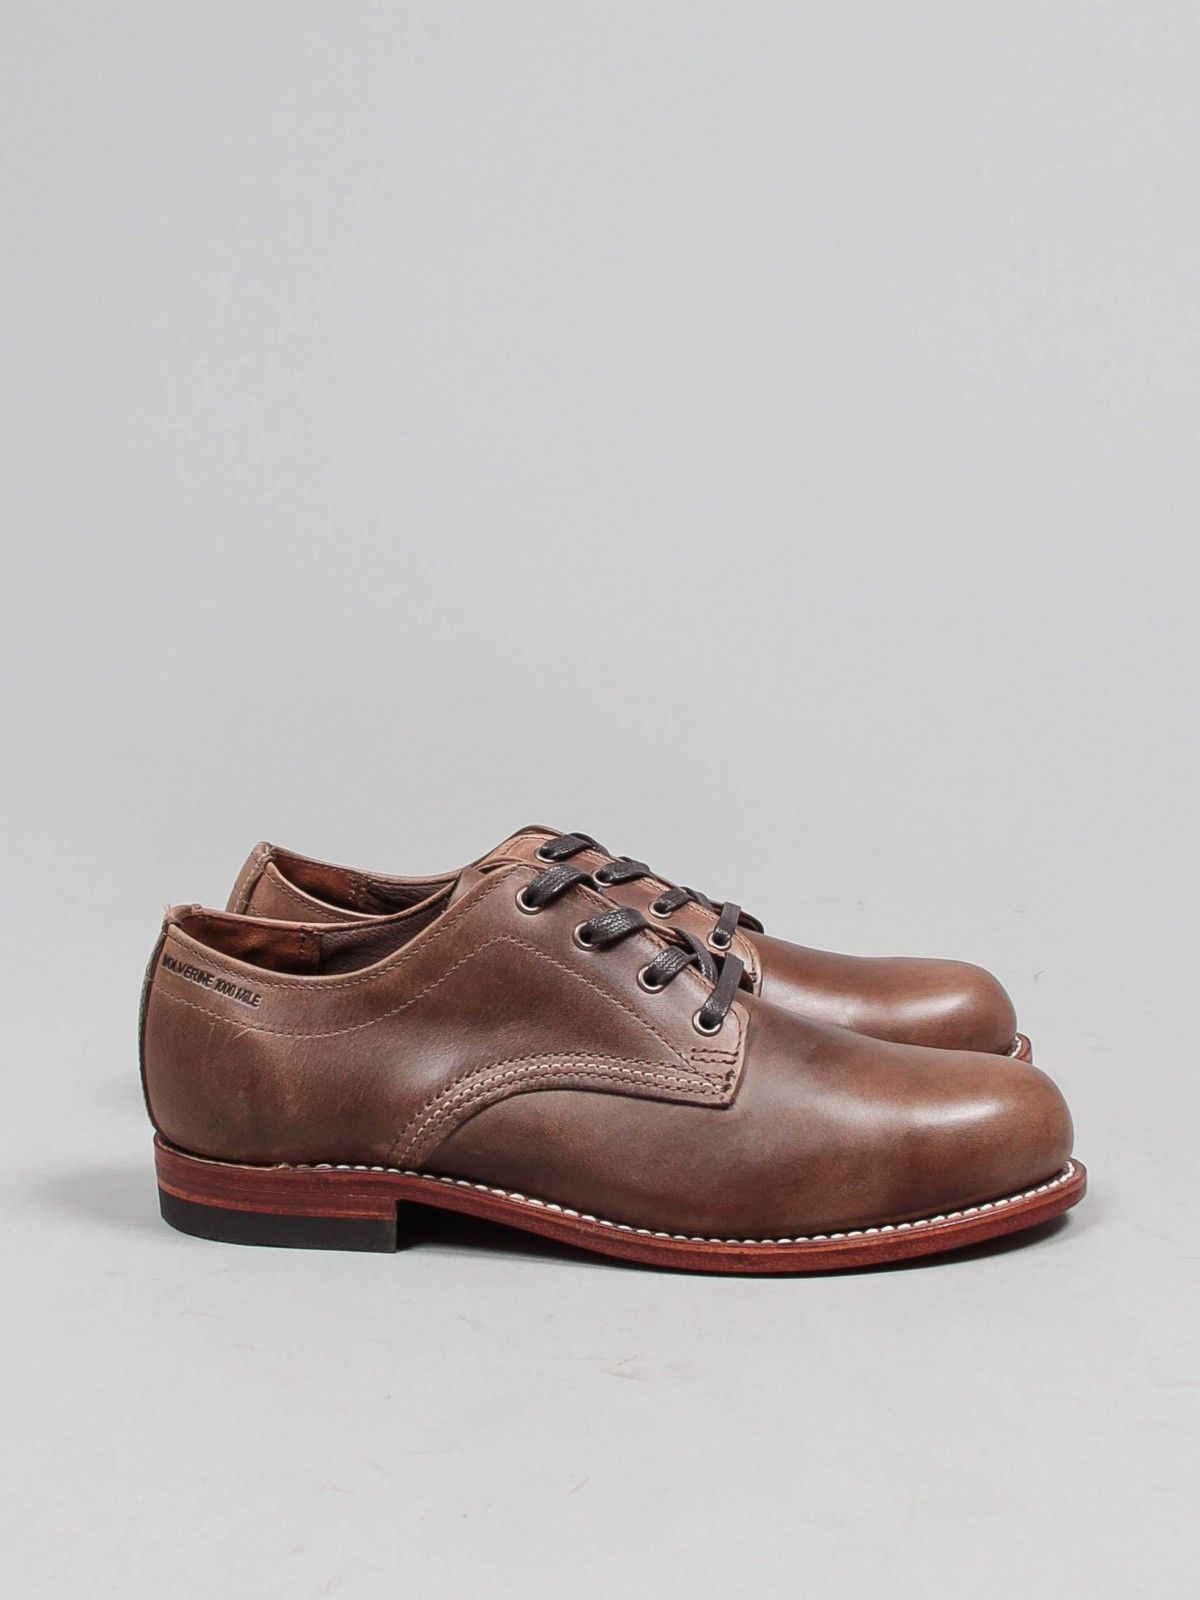 29e4b28d8ce wolverine 1000 mile, oxford, natural | WARDROBE 19 | Shoes